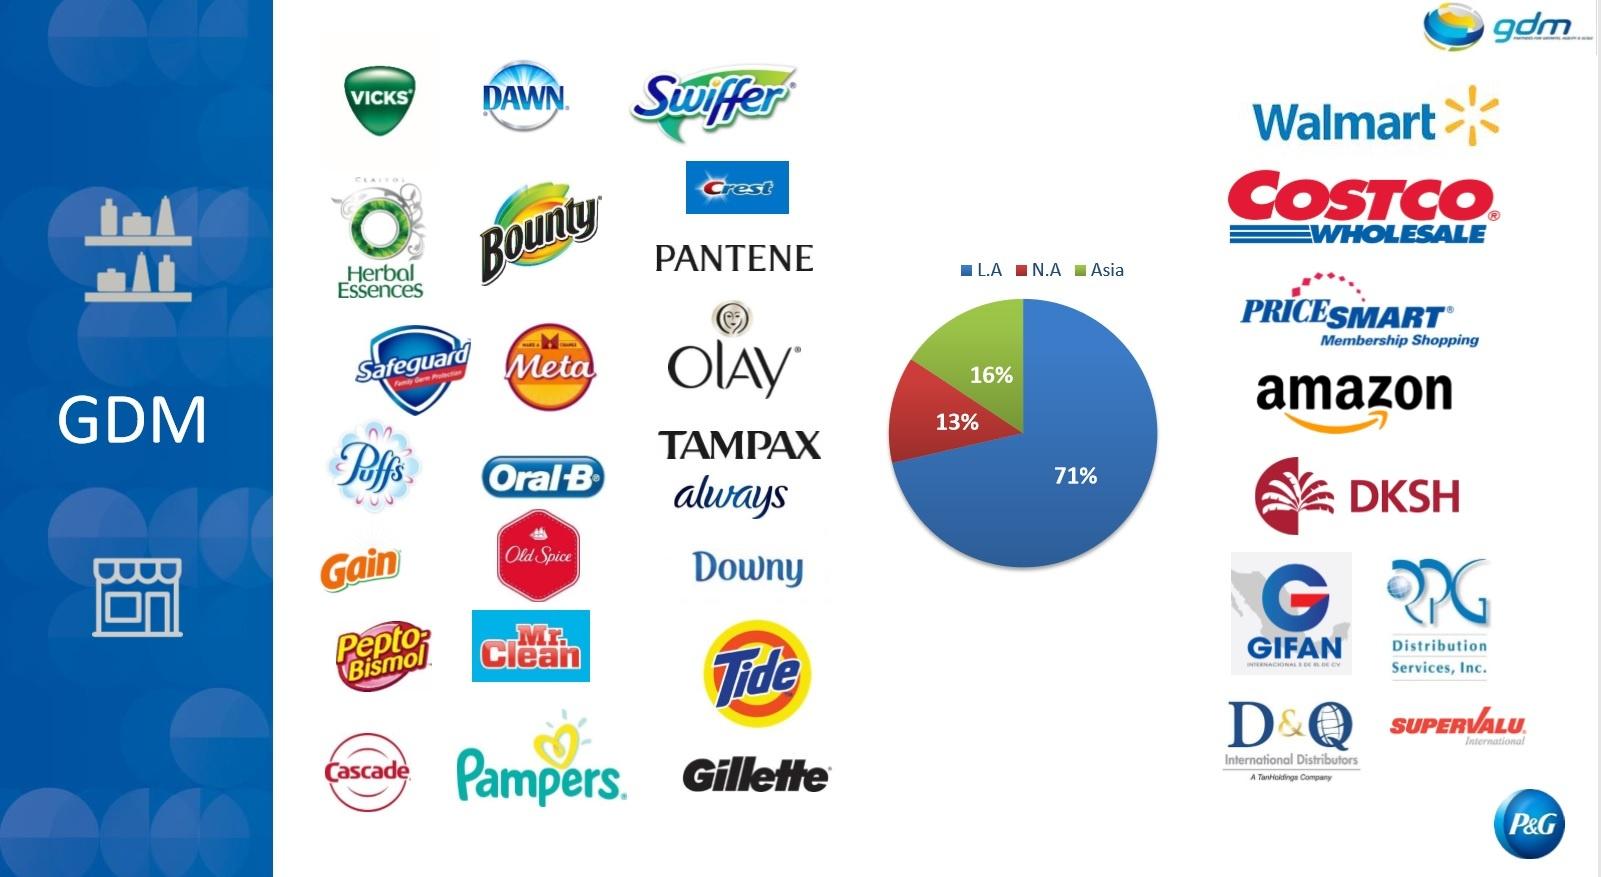 Procter Gamble Brands GDM